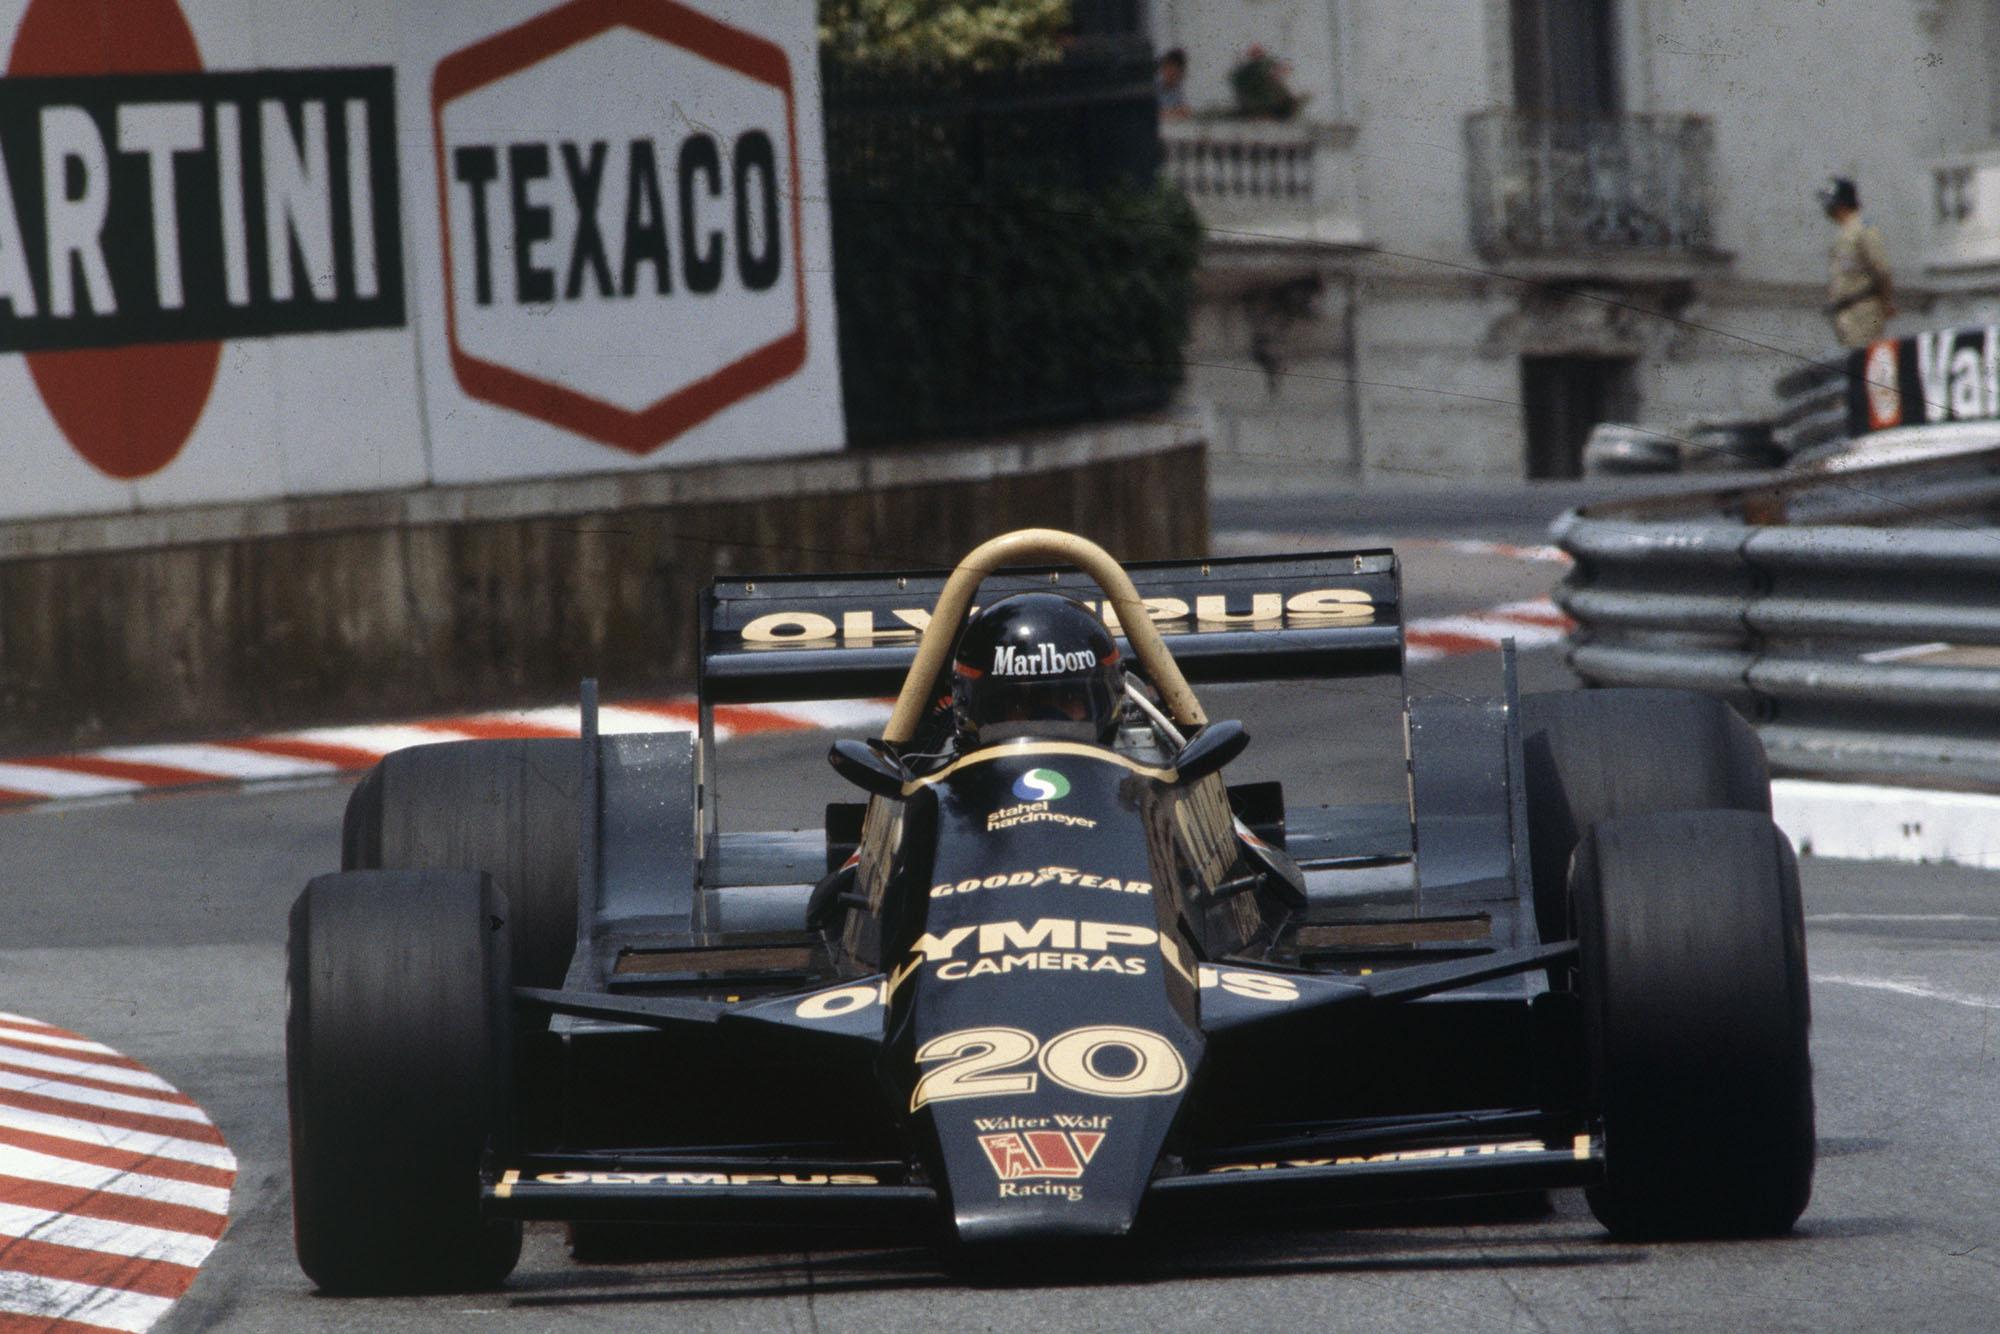 James Hunt (Wolf) driving at the 1979 Monaco Grand Prix.